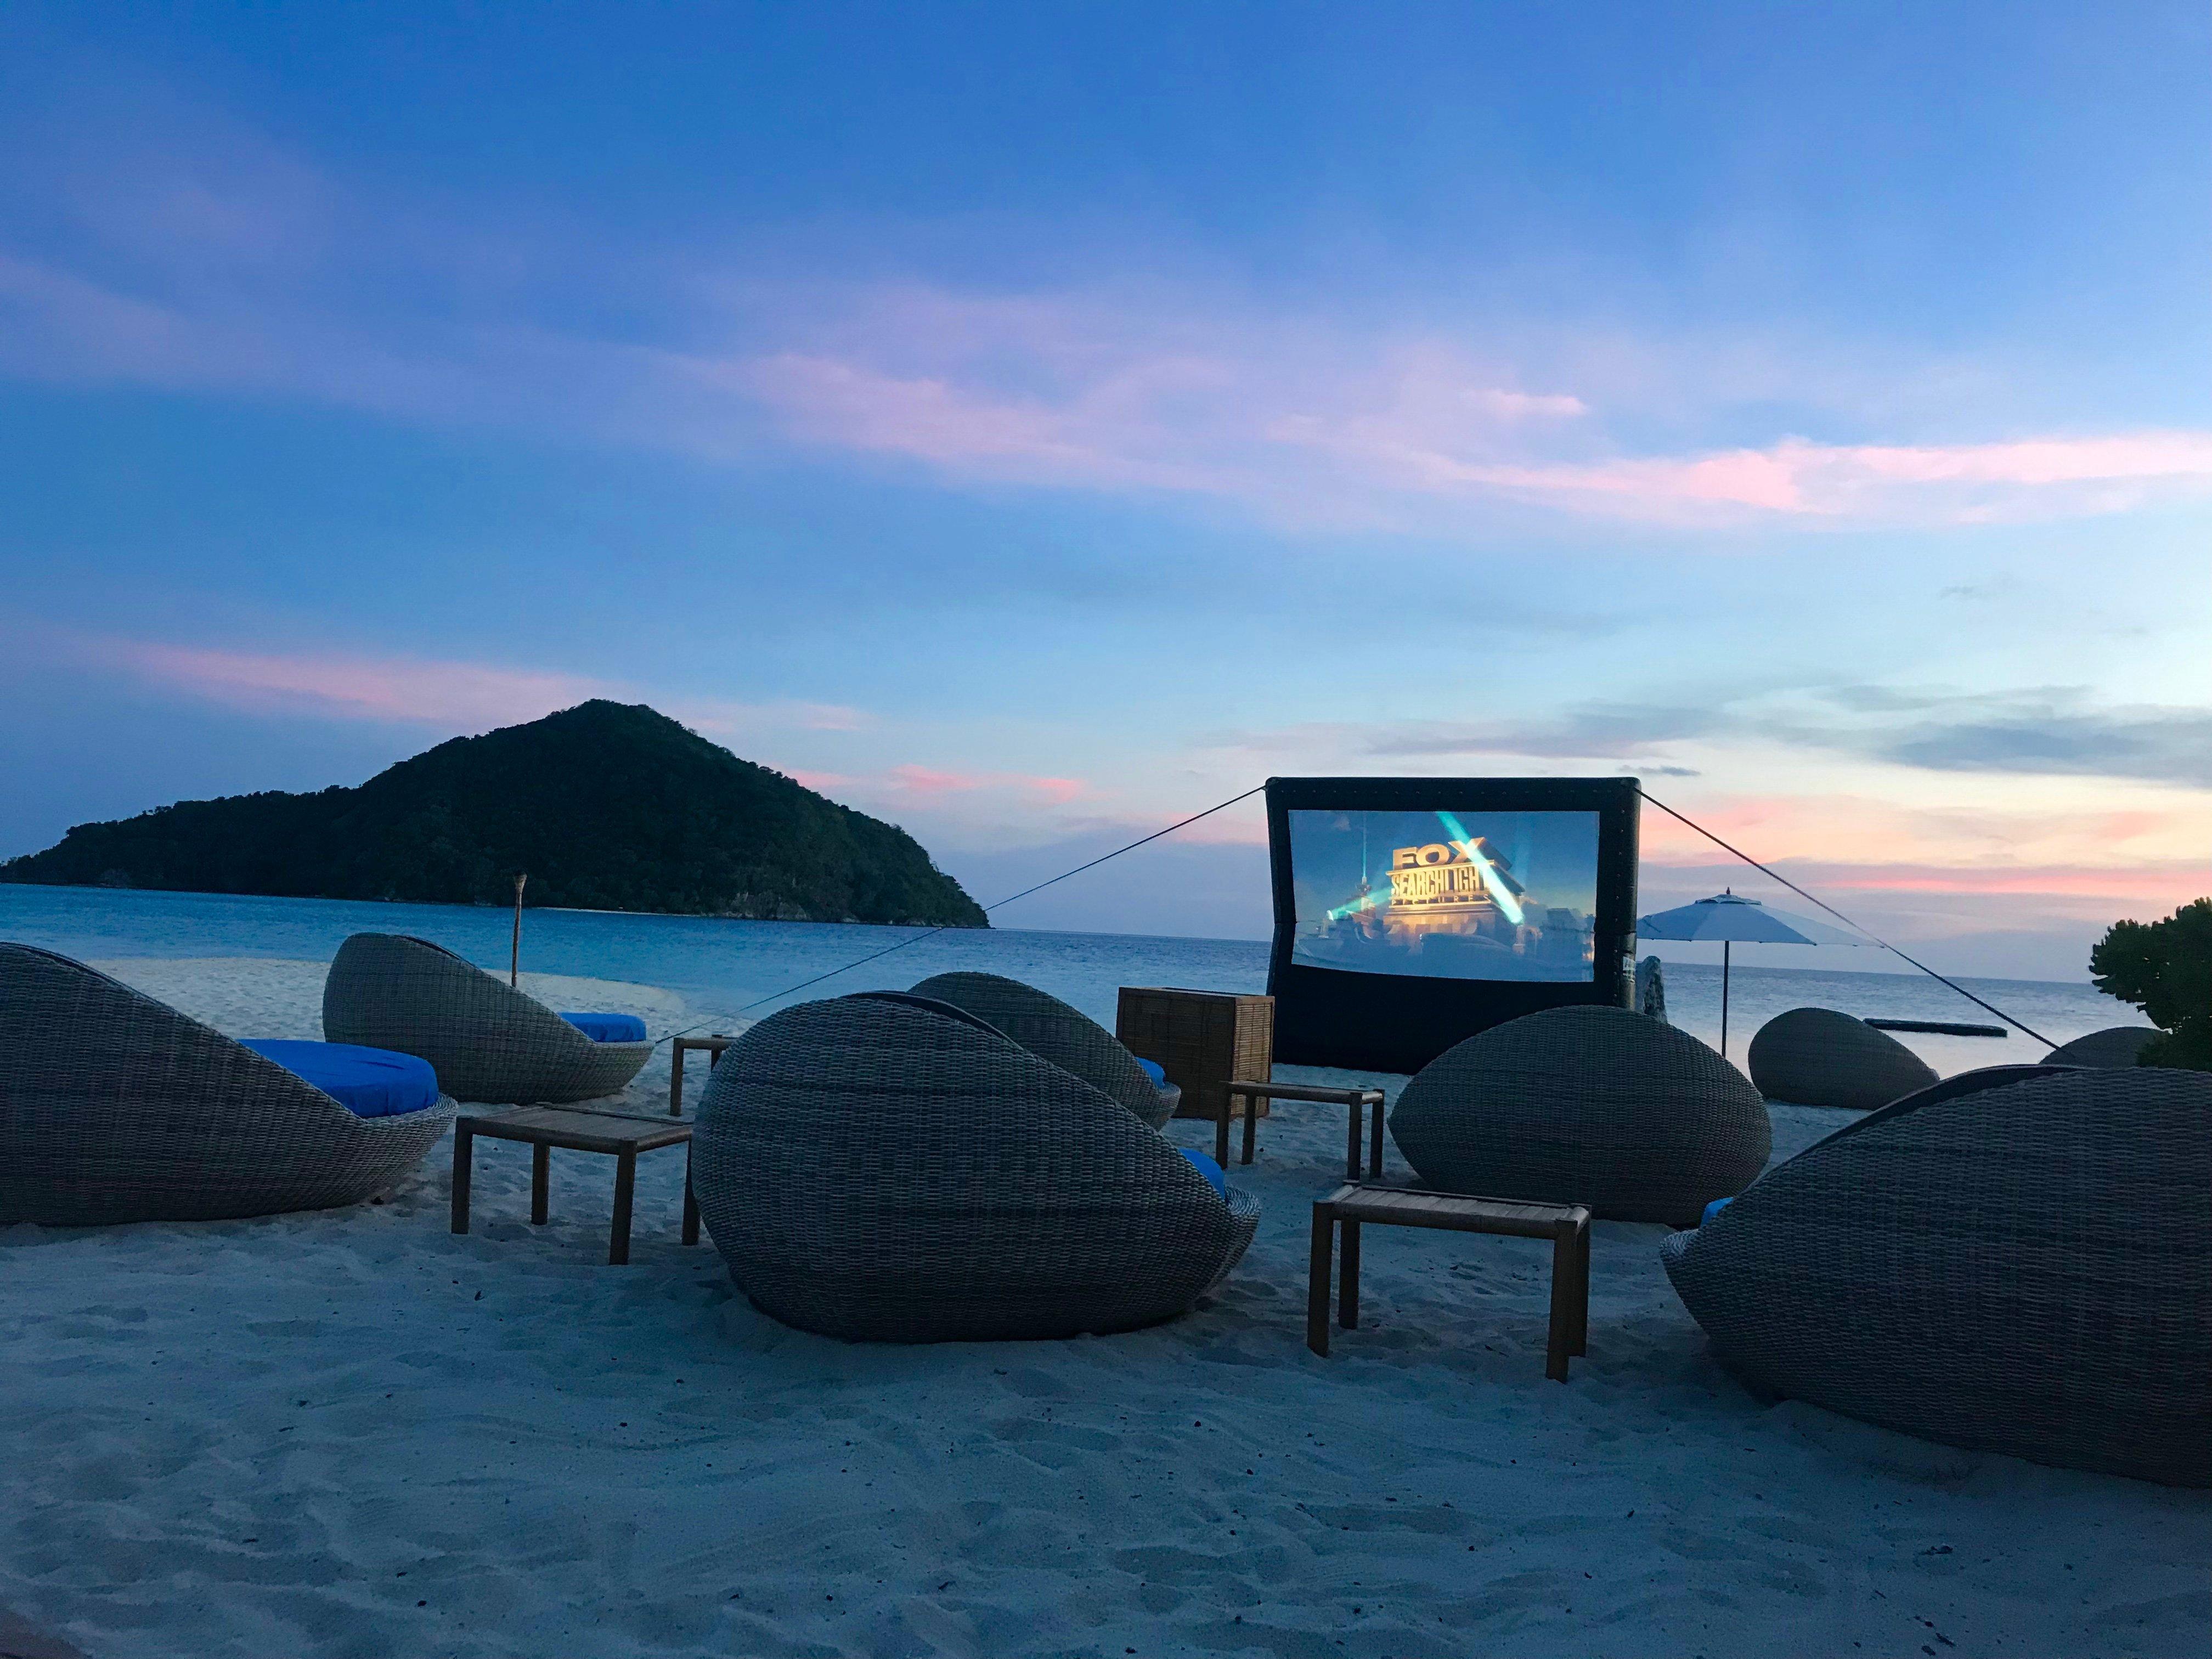 Outdoor beach cinema movie night